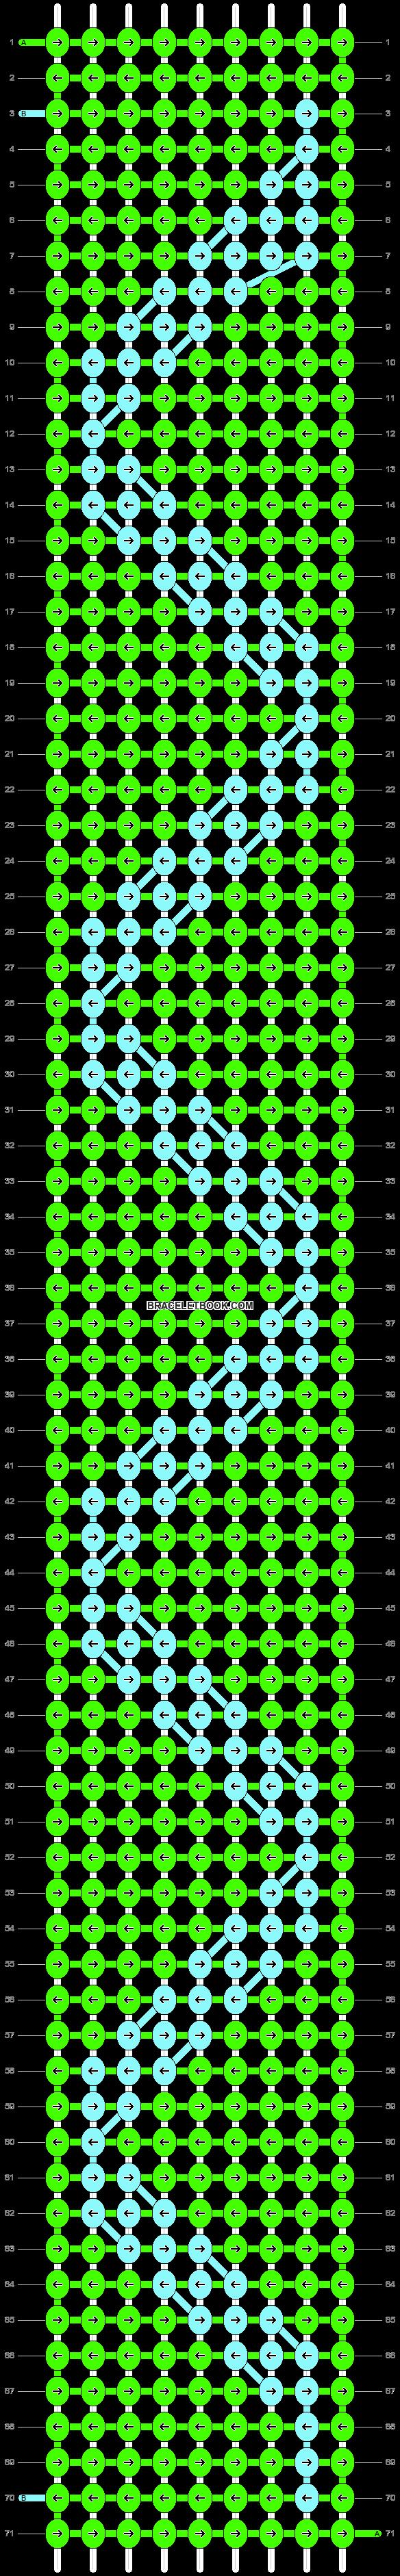 Alpha pattern #26900 variation #13108 pattern